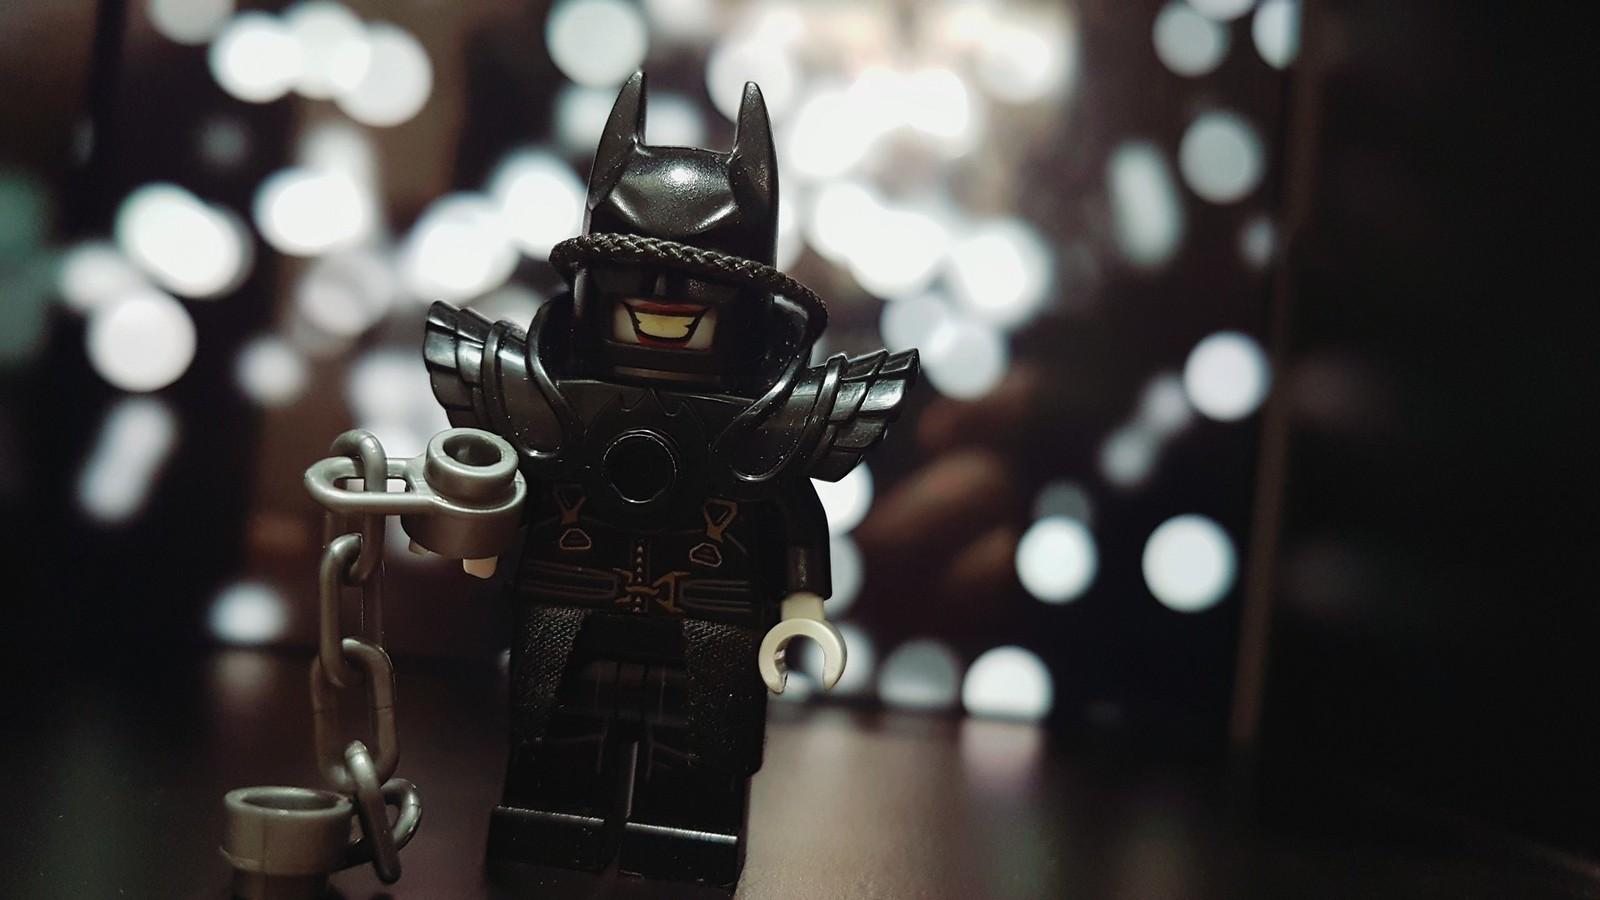 The Batman Who Laughs The Brick Legend Flickr